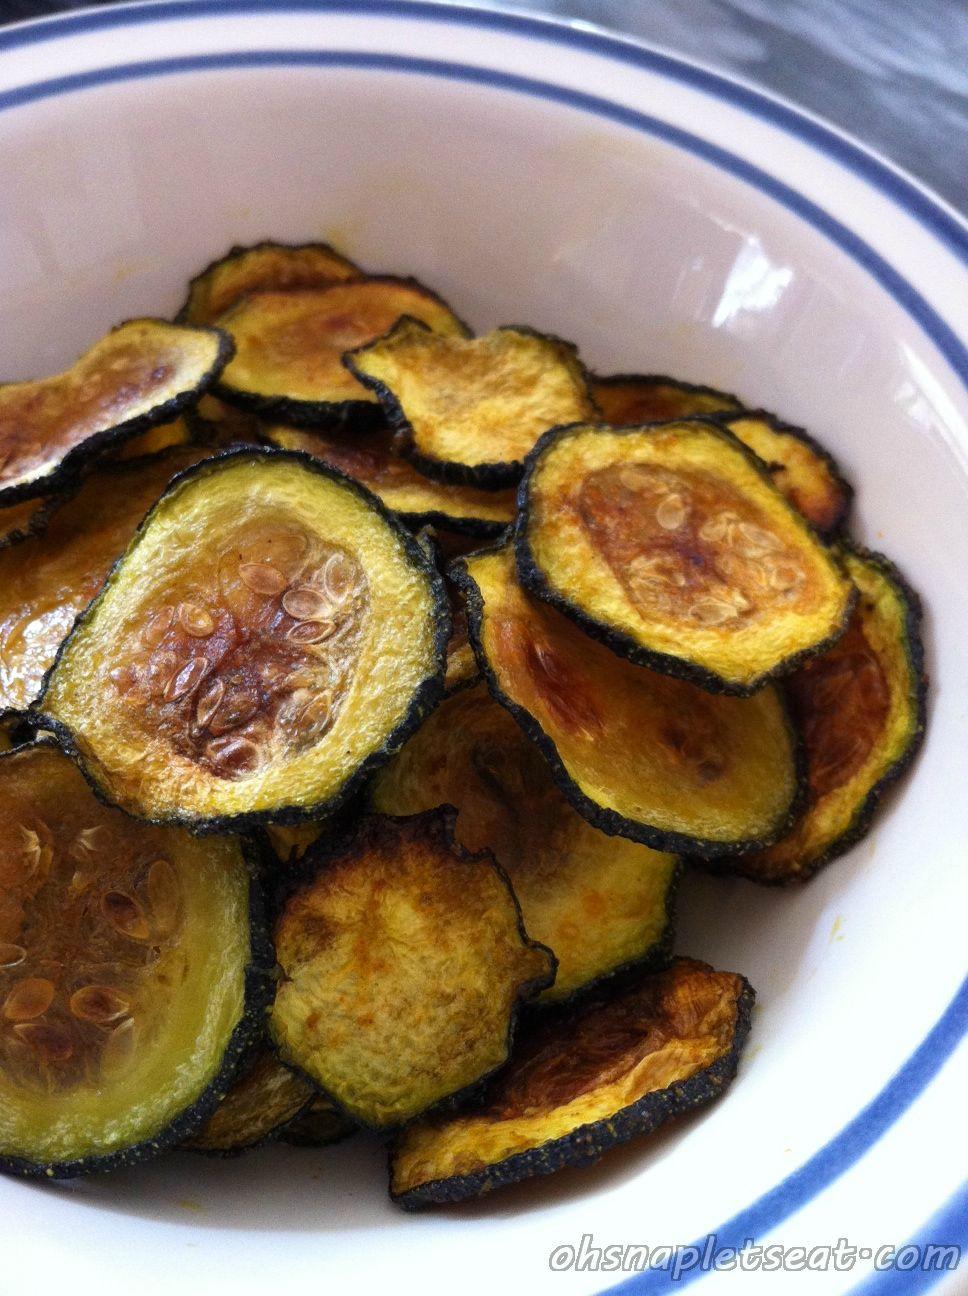 Healthy Baked Snacks  Oven Baked Zucchini Chips Paleo Keto Vegan Whole30